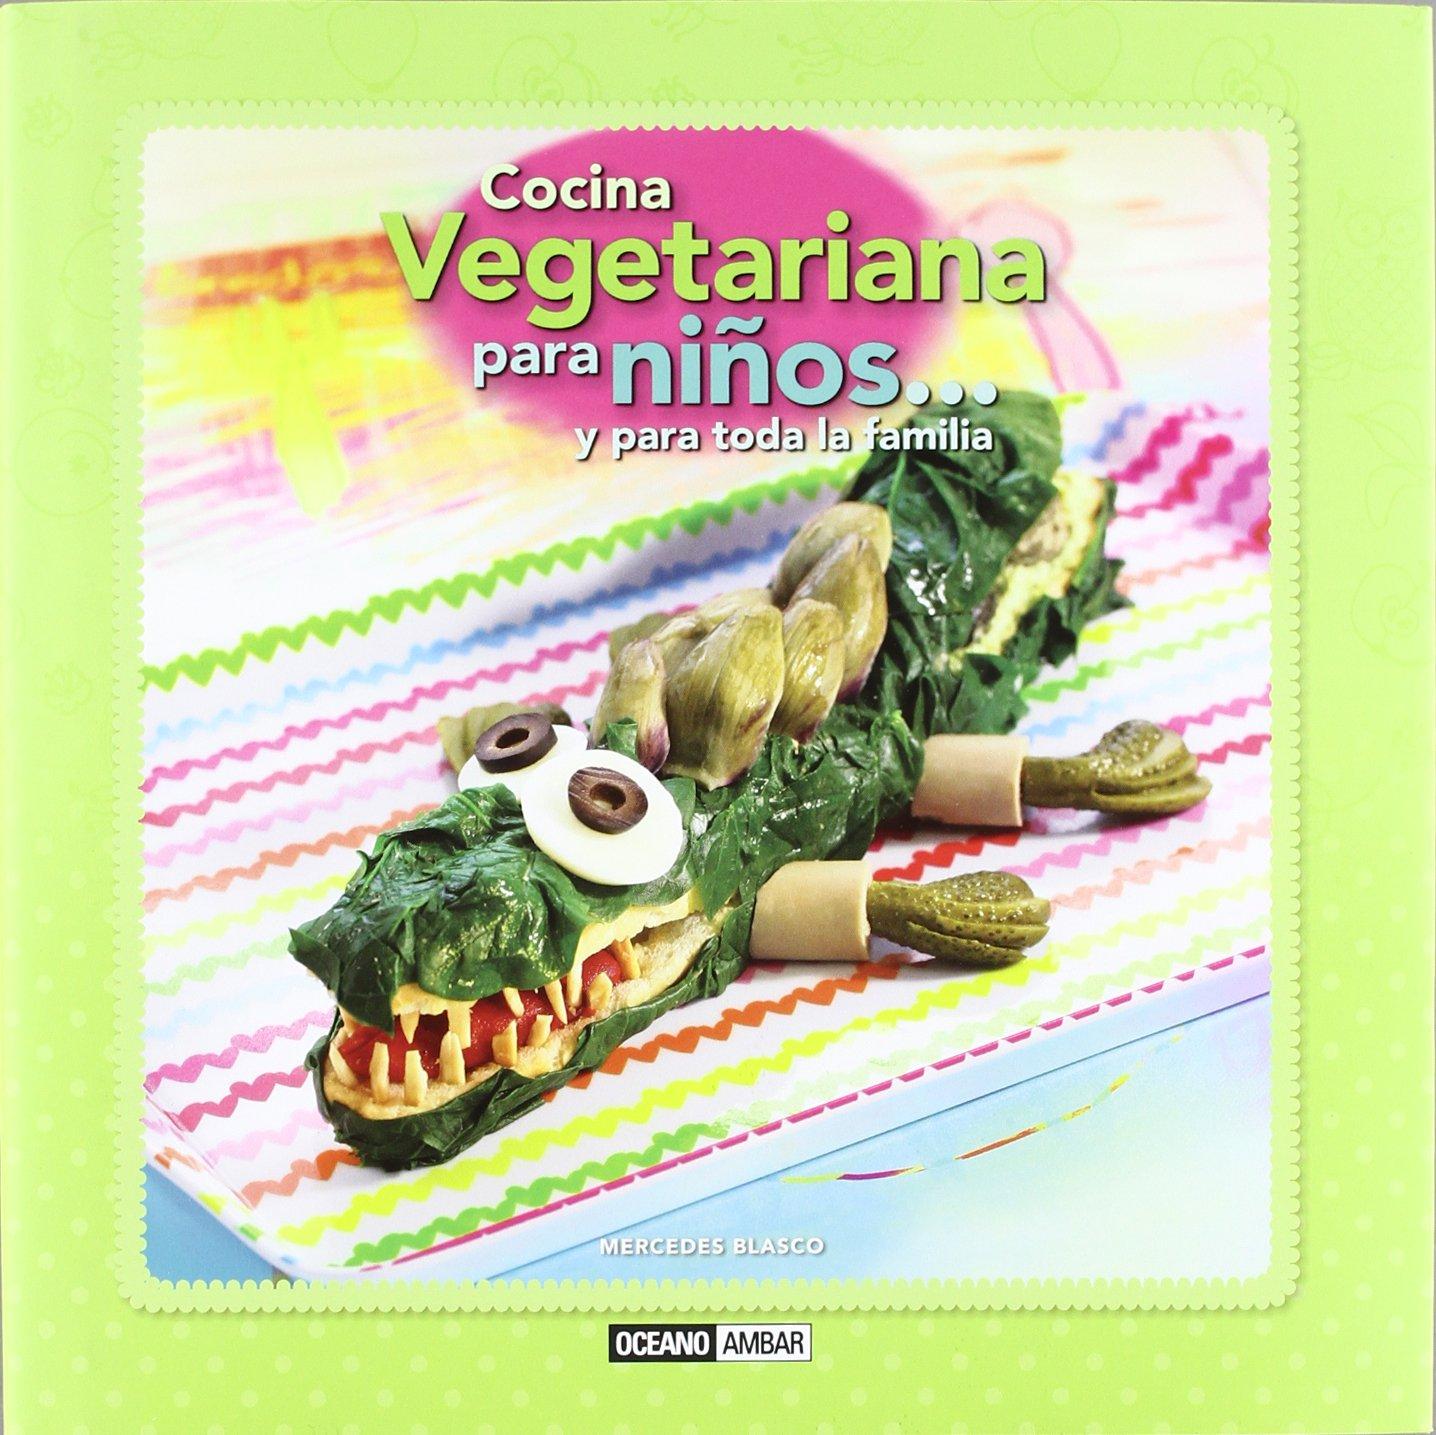 Cocina vegetariana para niños... y para toda la familia (Cocina NAtural) Tapa dura – 1 jun 2012 Mercedes Blasco Oceano Ambar 8475568017 Cooking for/with children